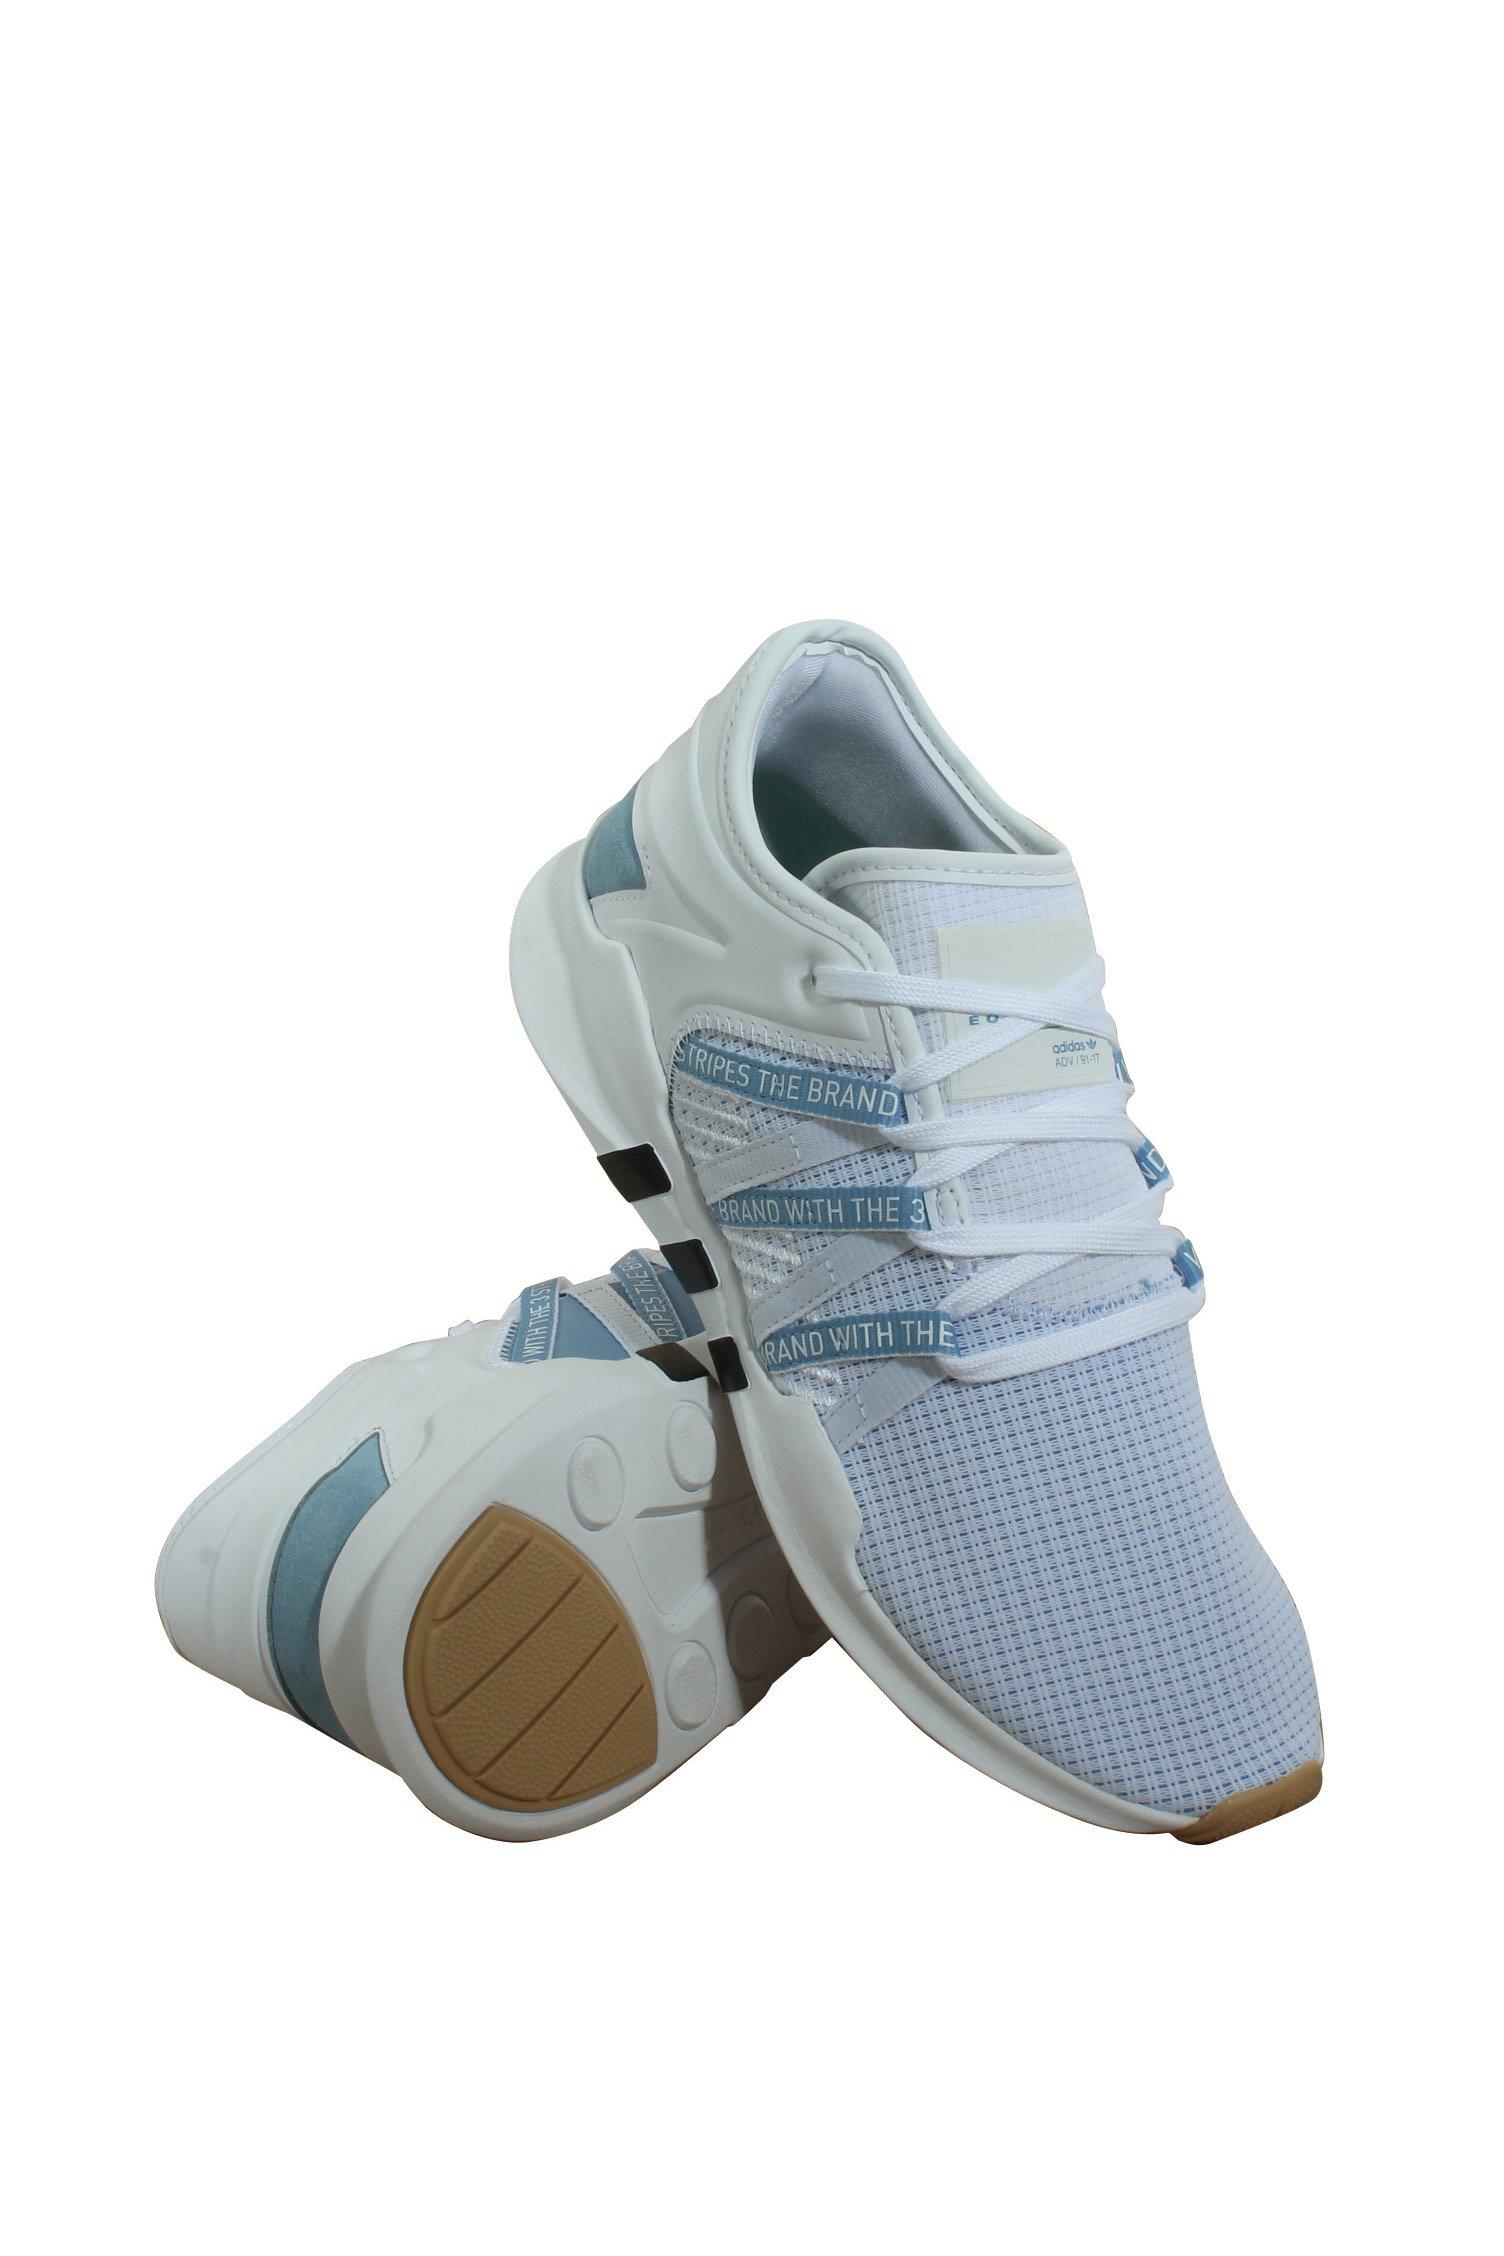 Adidas Women's EQT Racing ADV Originals Ftwwht/Ashblu/Cblack Training Shoe 5.5 Women US by adidas